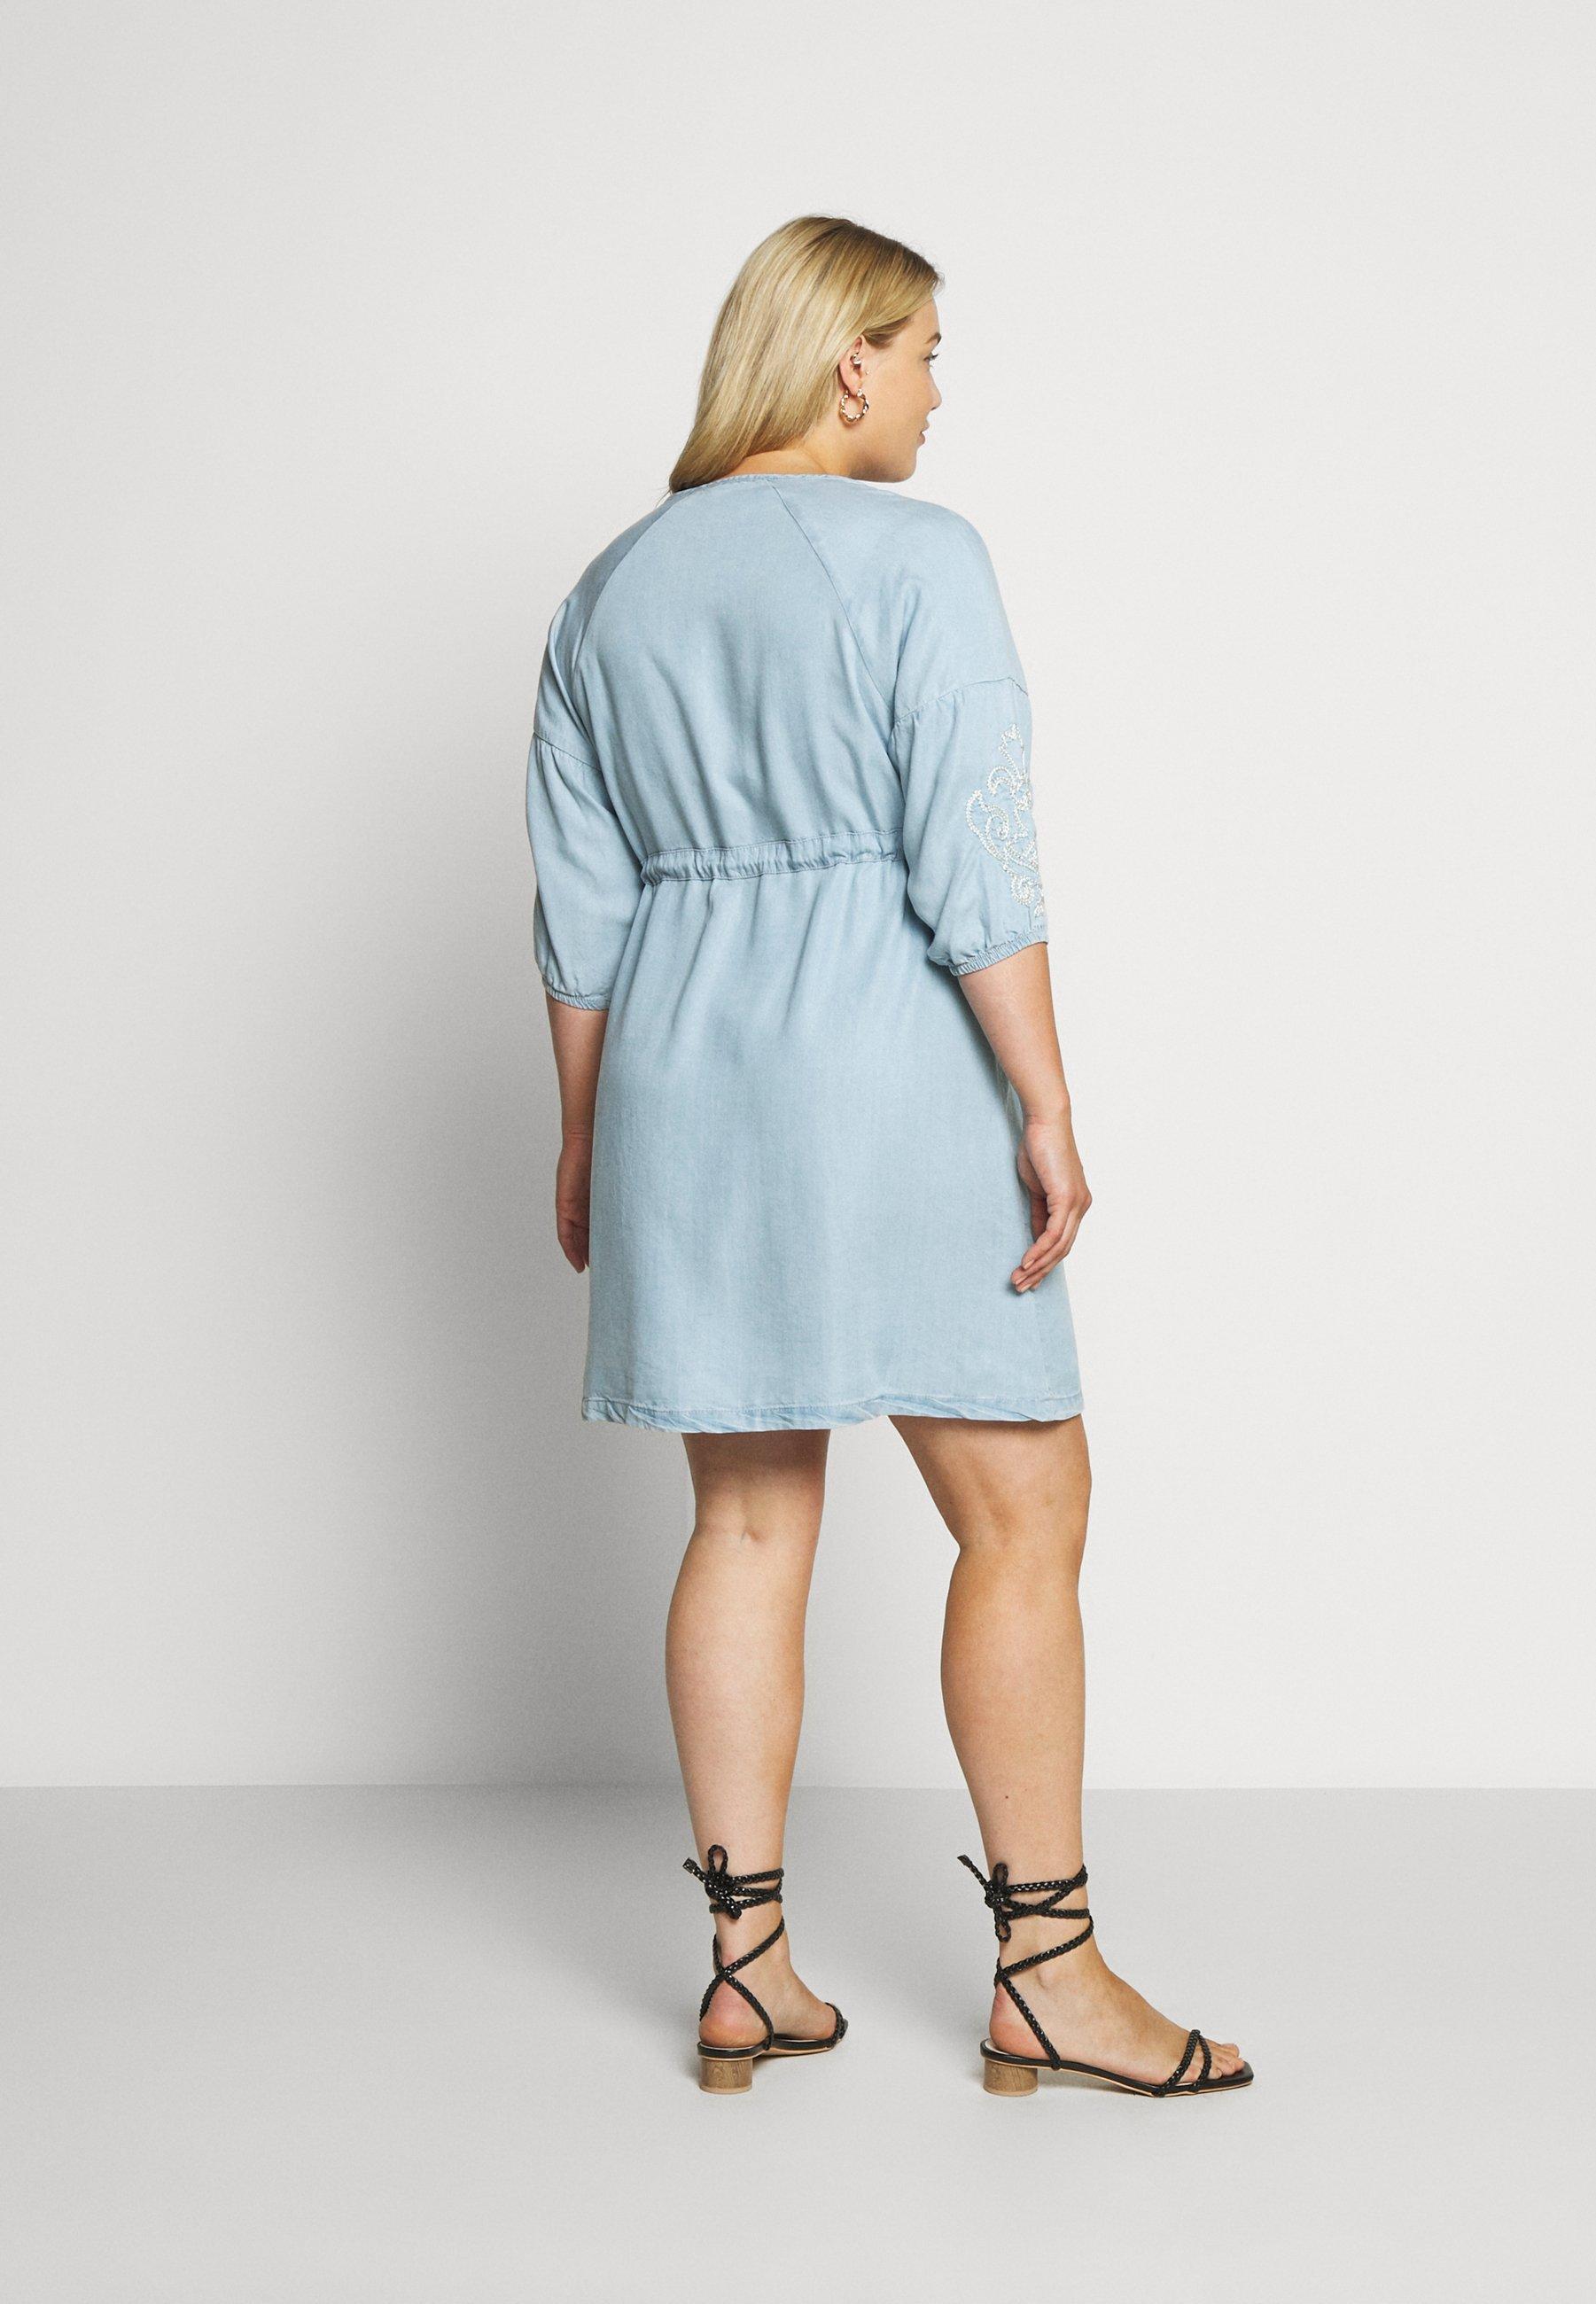 ZAY YINGE  DRESS - Day dress - light blue denim - Women's Clothing UC9GC